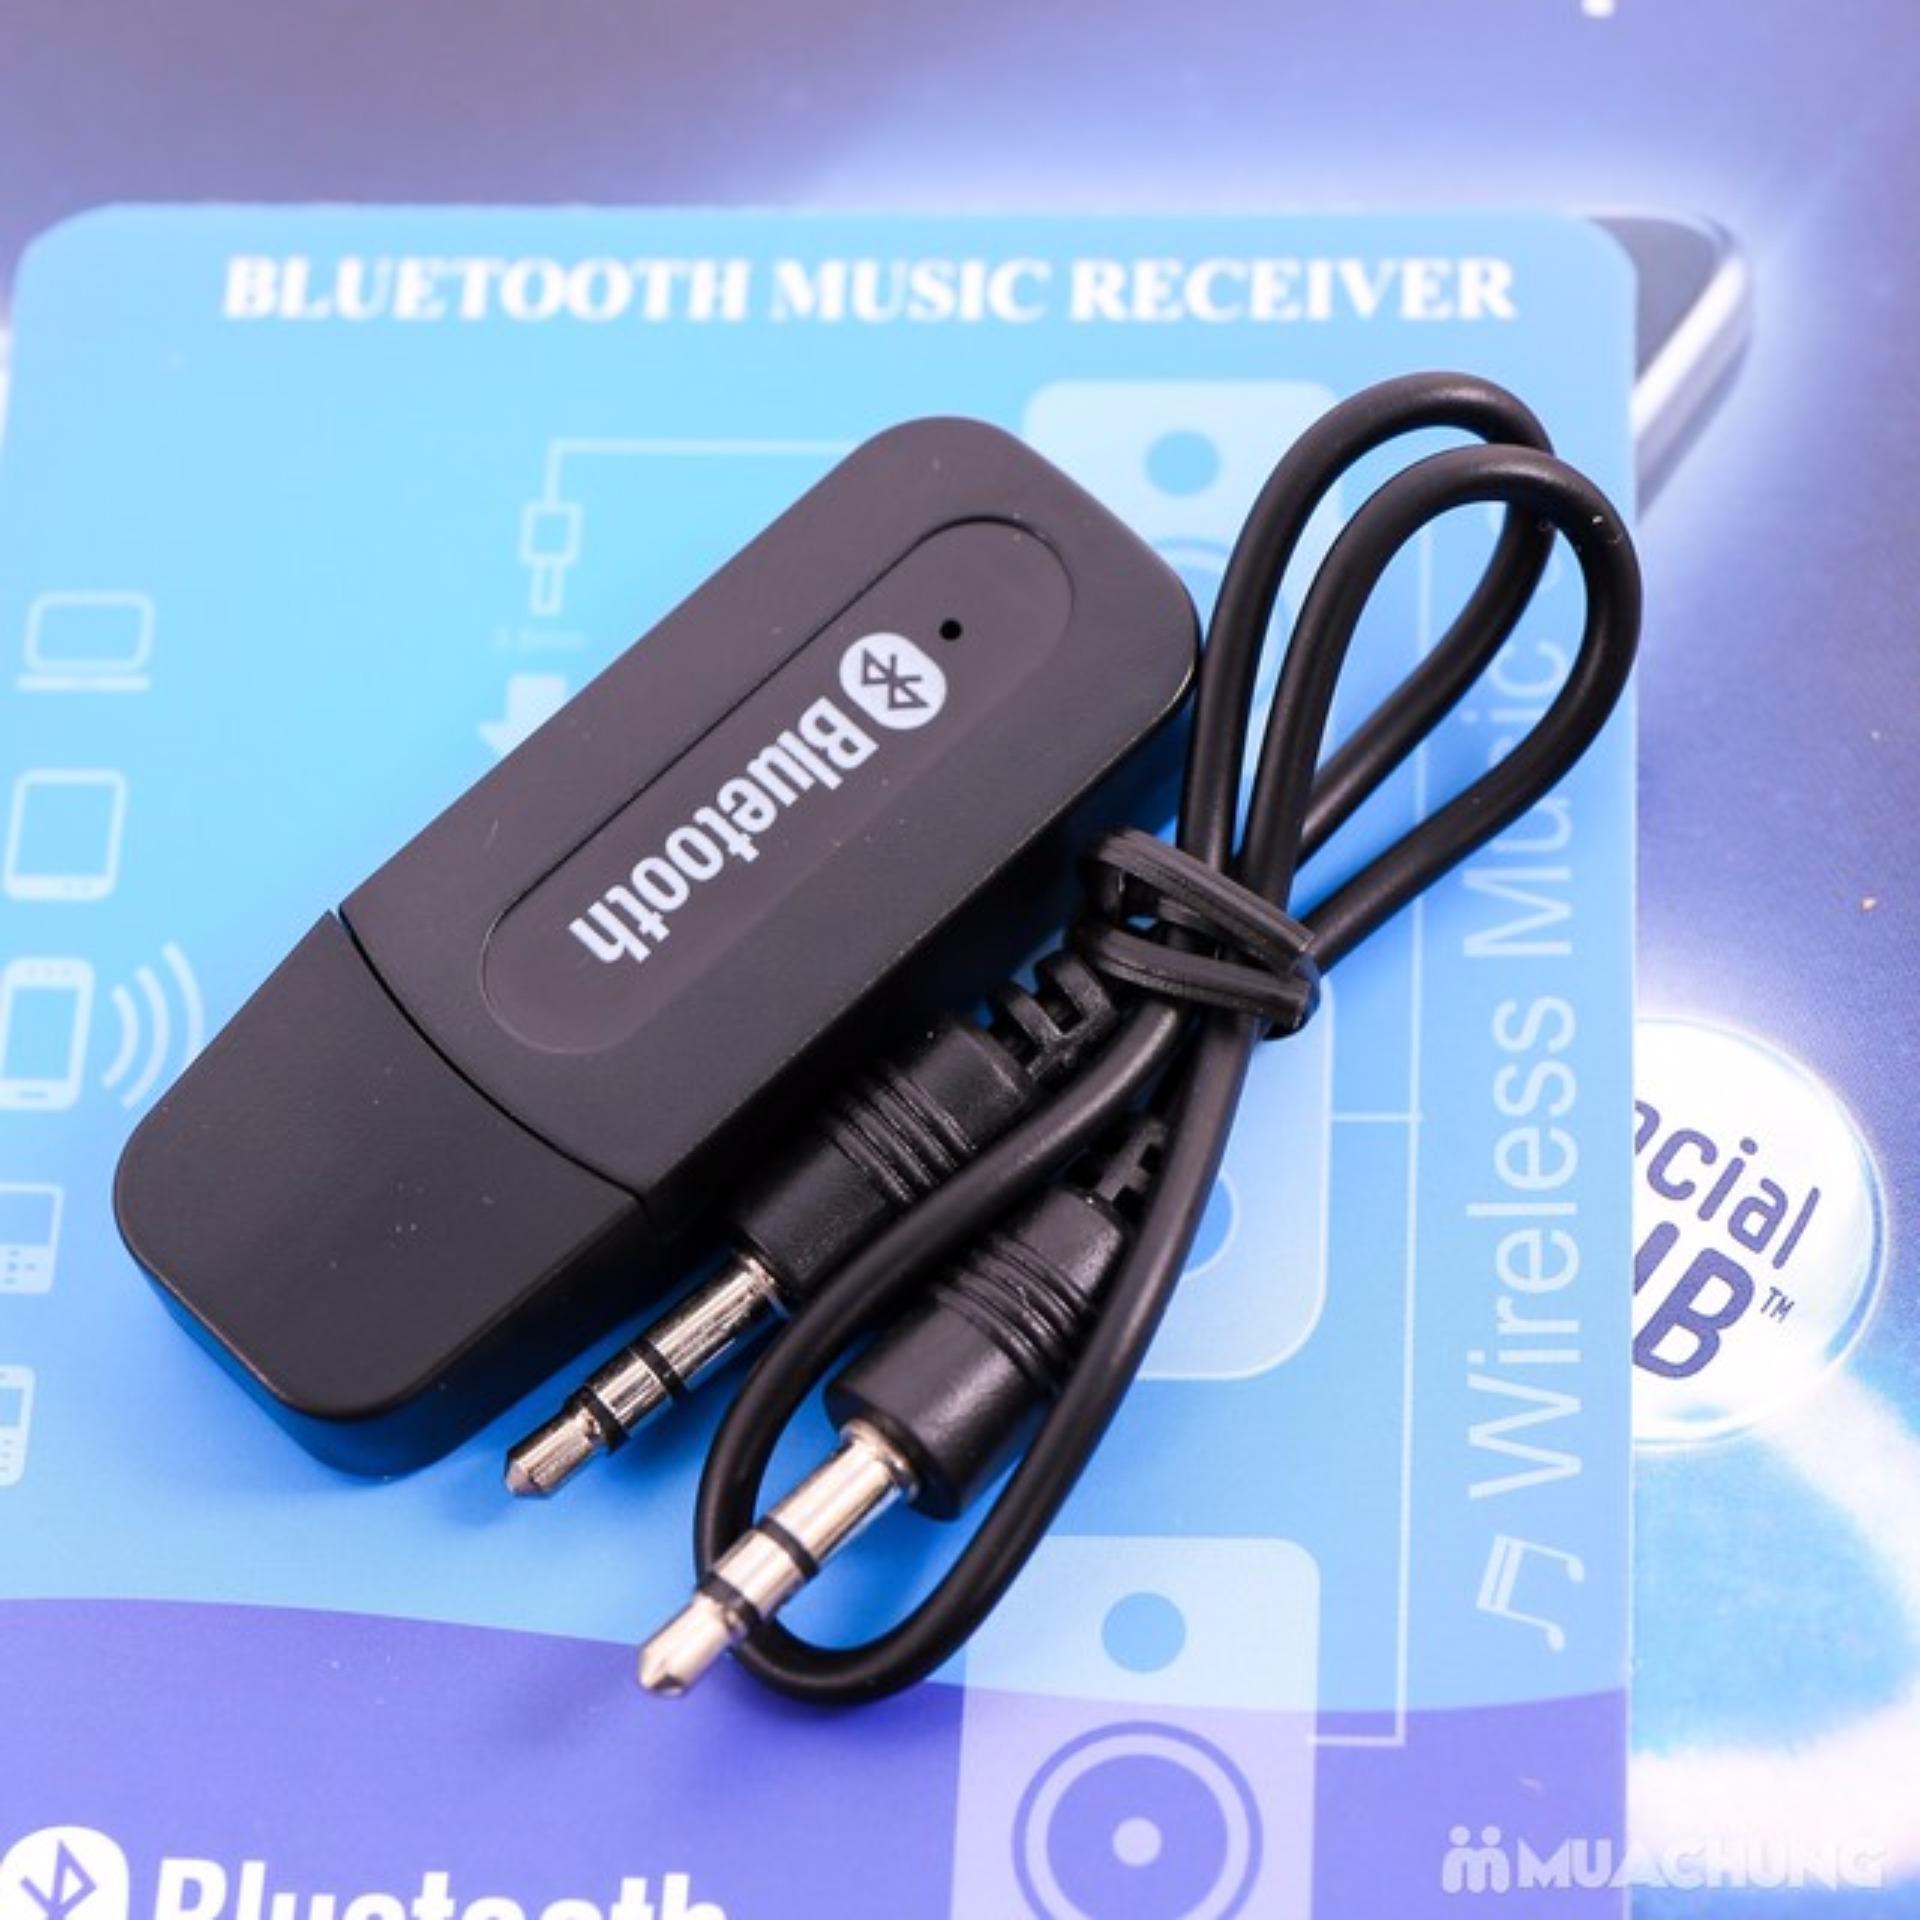 Mua USB BLUETOOTH – BIẾN LOA THƯỜNG THÀNH LOA USB BLUETOOTH Tại NGOISAOMOI